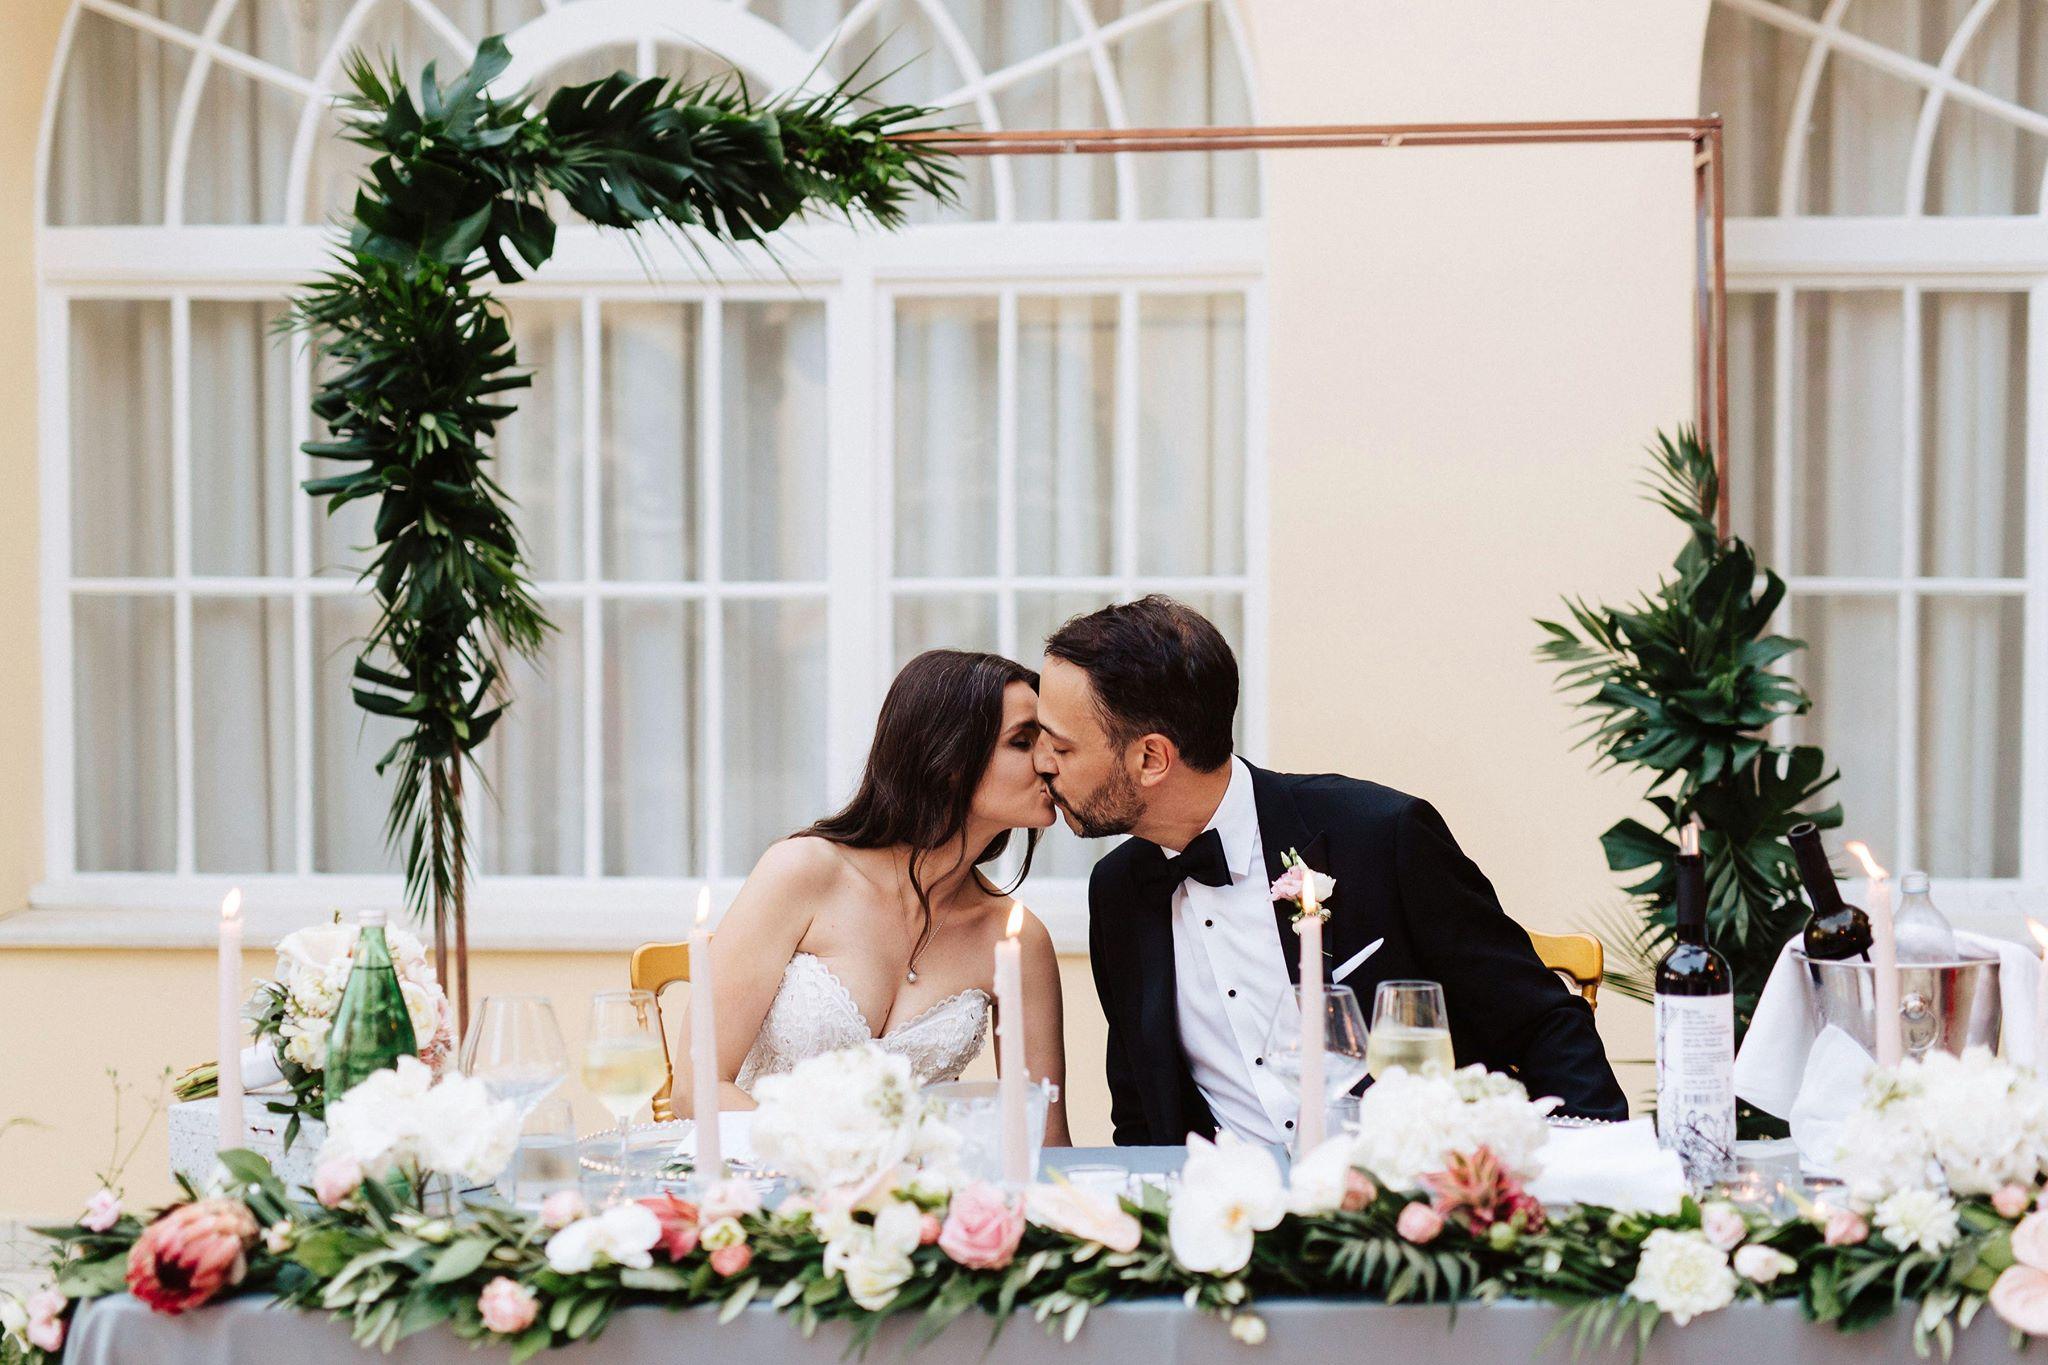 tietheknot_vilicomkozhrvatsku_vjenčanja